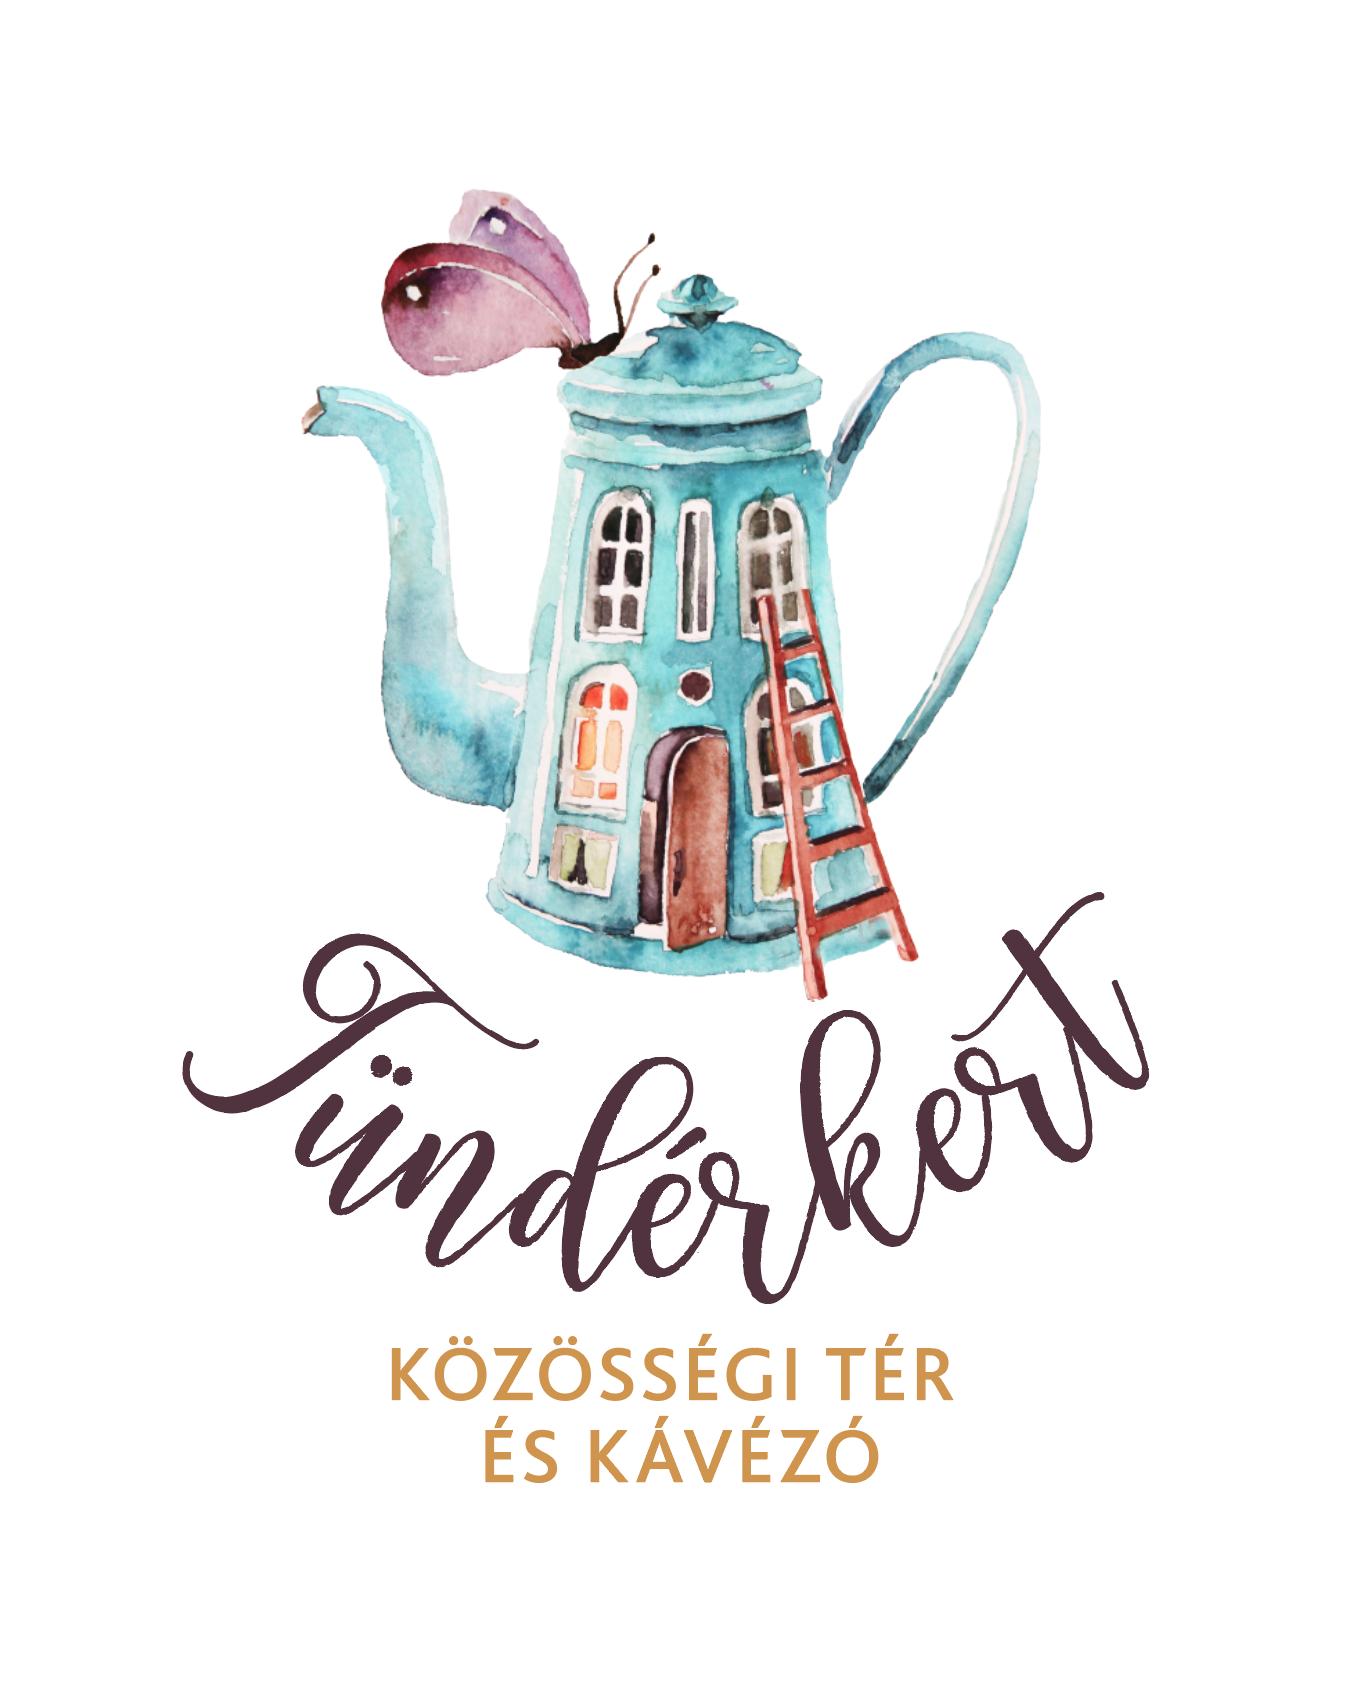 logo_tunderkert